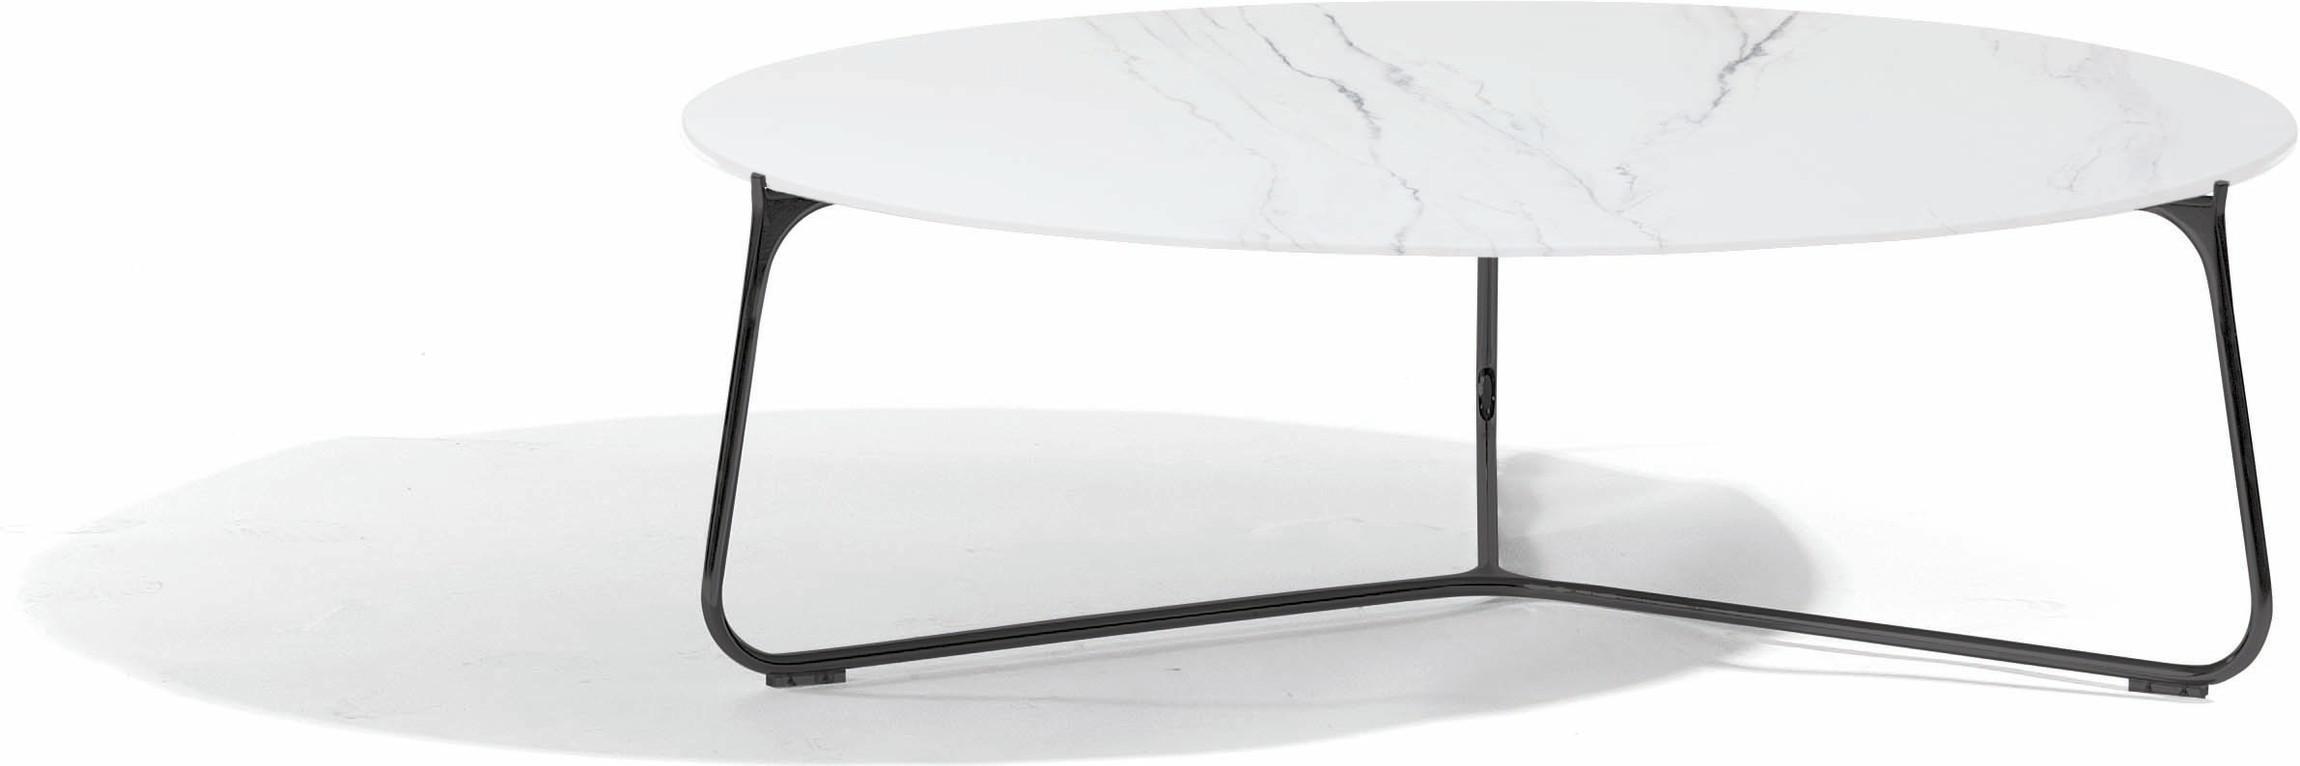 Tavolino da caffè Mood - lava - ceramica marmo bianco - 100